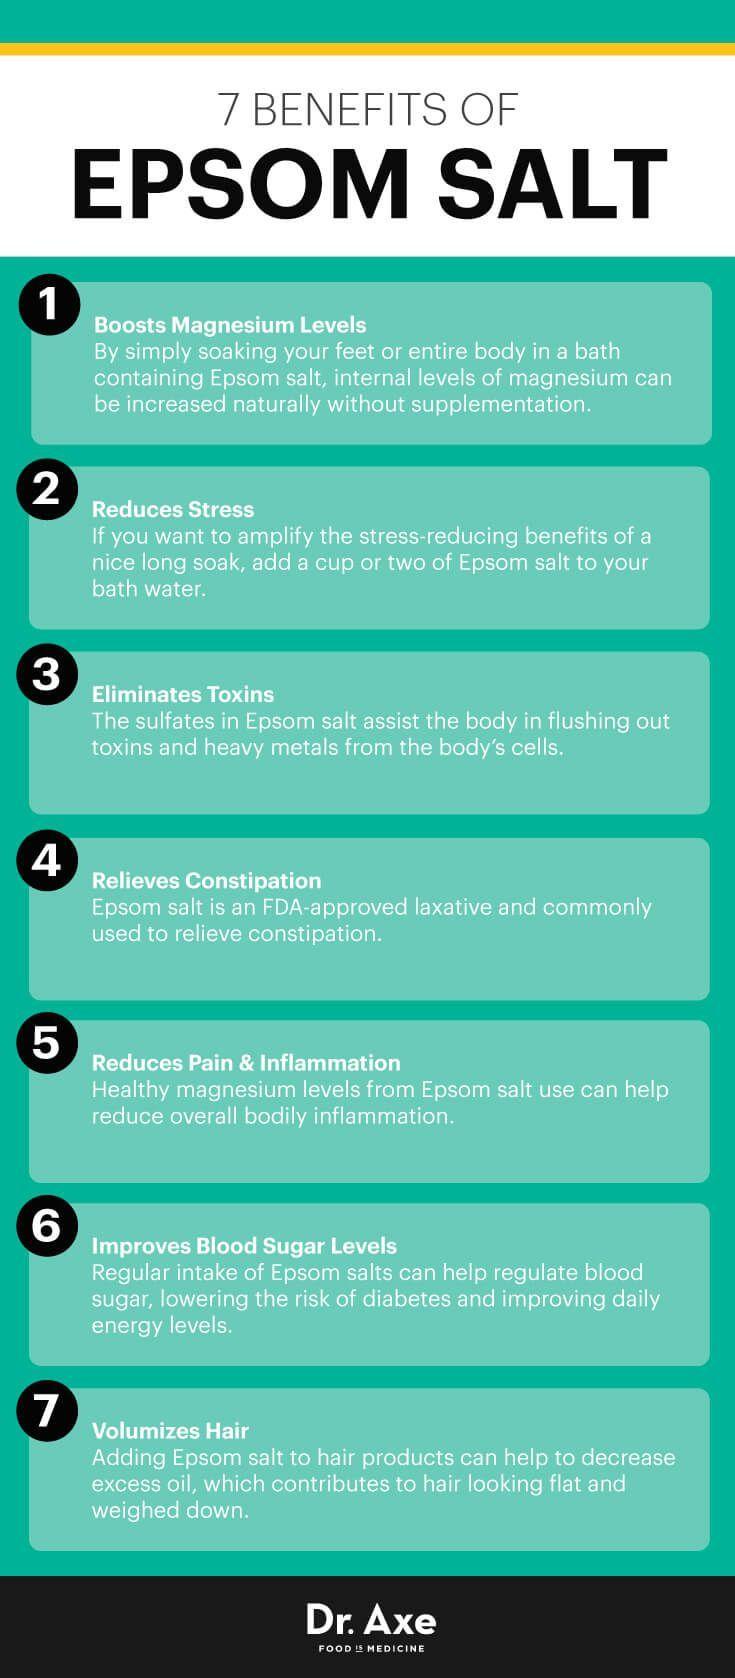 best 20 epsom salt benefits ideas on pinterest epsom salt uses remedies for sunburn and. Black Bedroom Furniture Sets. Home Design Ideas